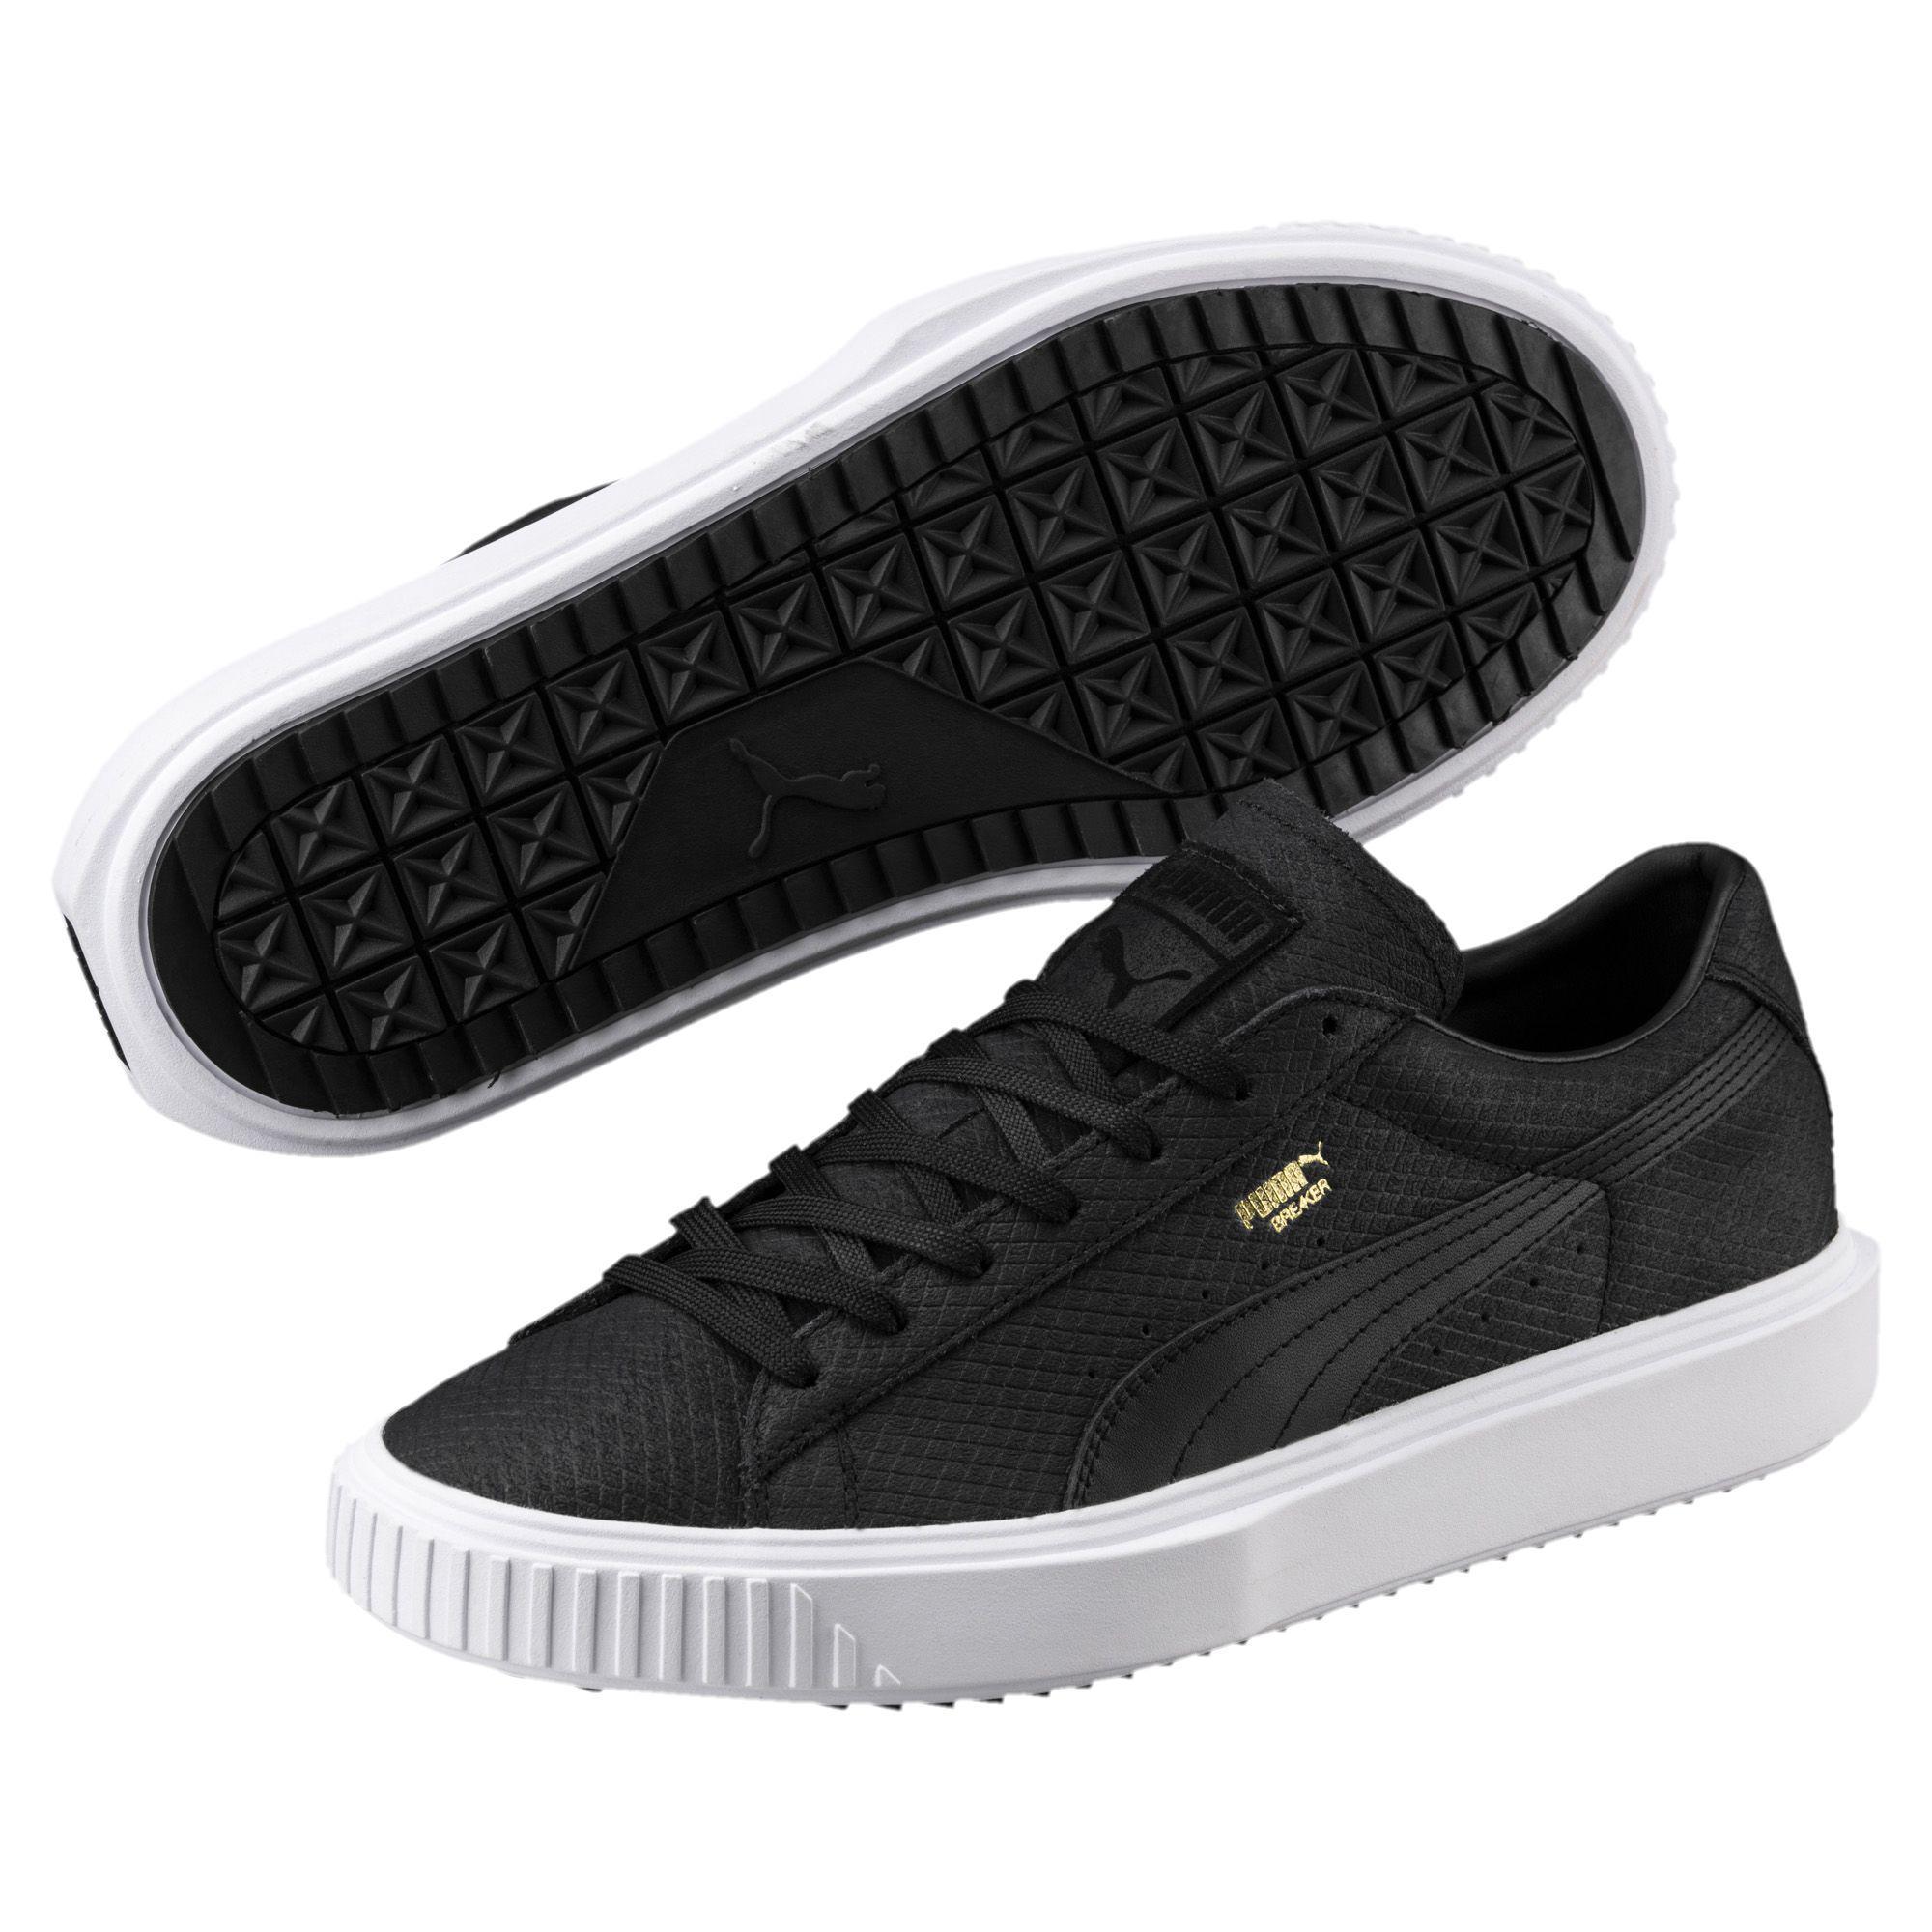 04fc2ba5519c4f ... official images PUMA - Black Suede Breaker Sneakers for Men - Lyst.